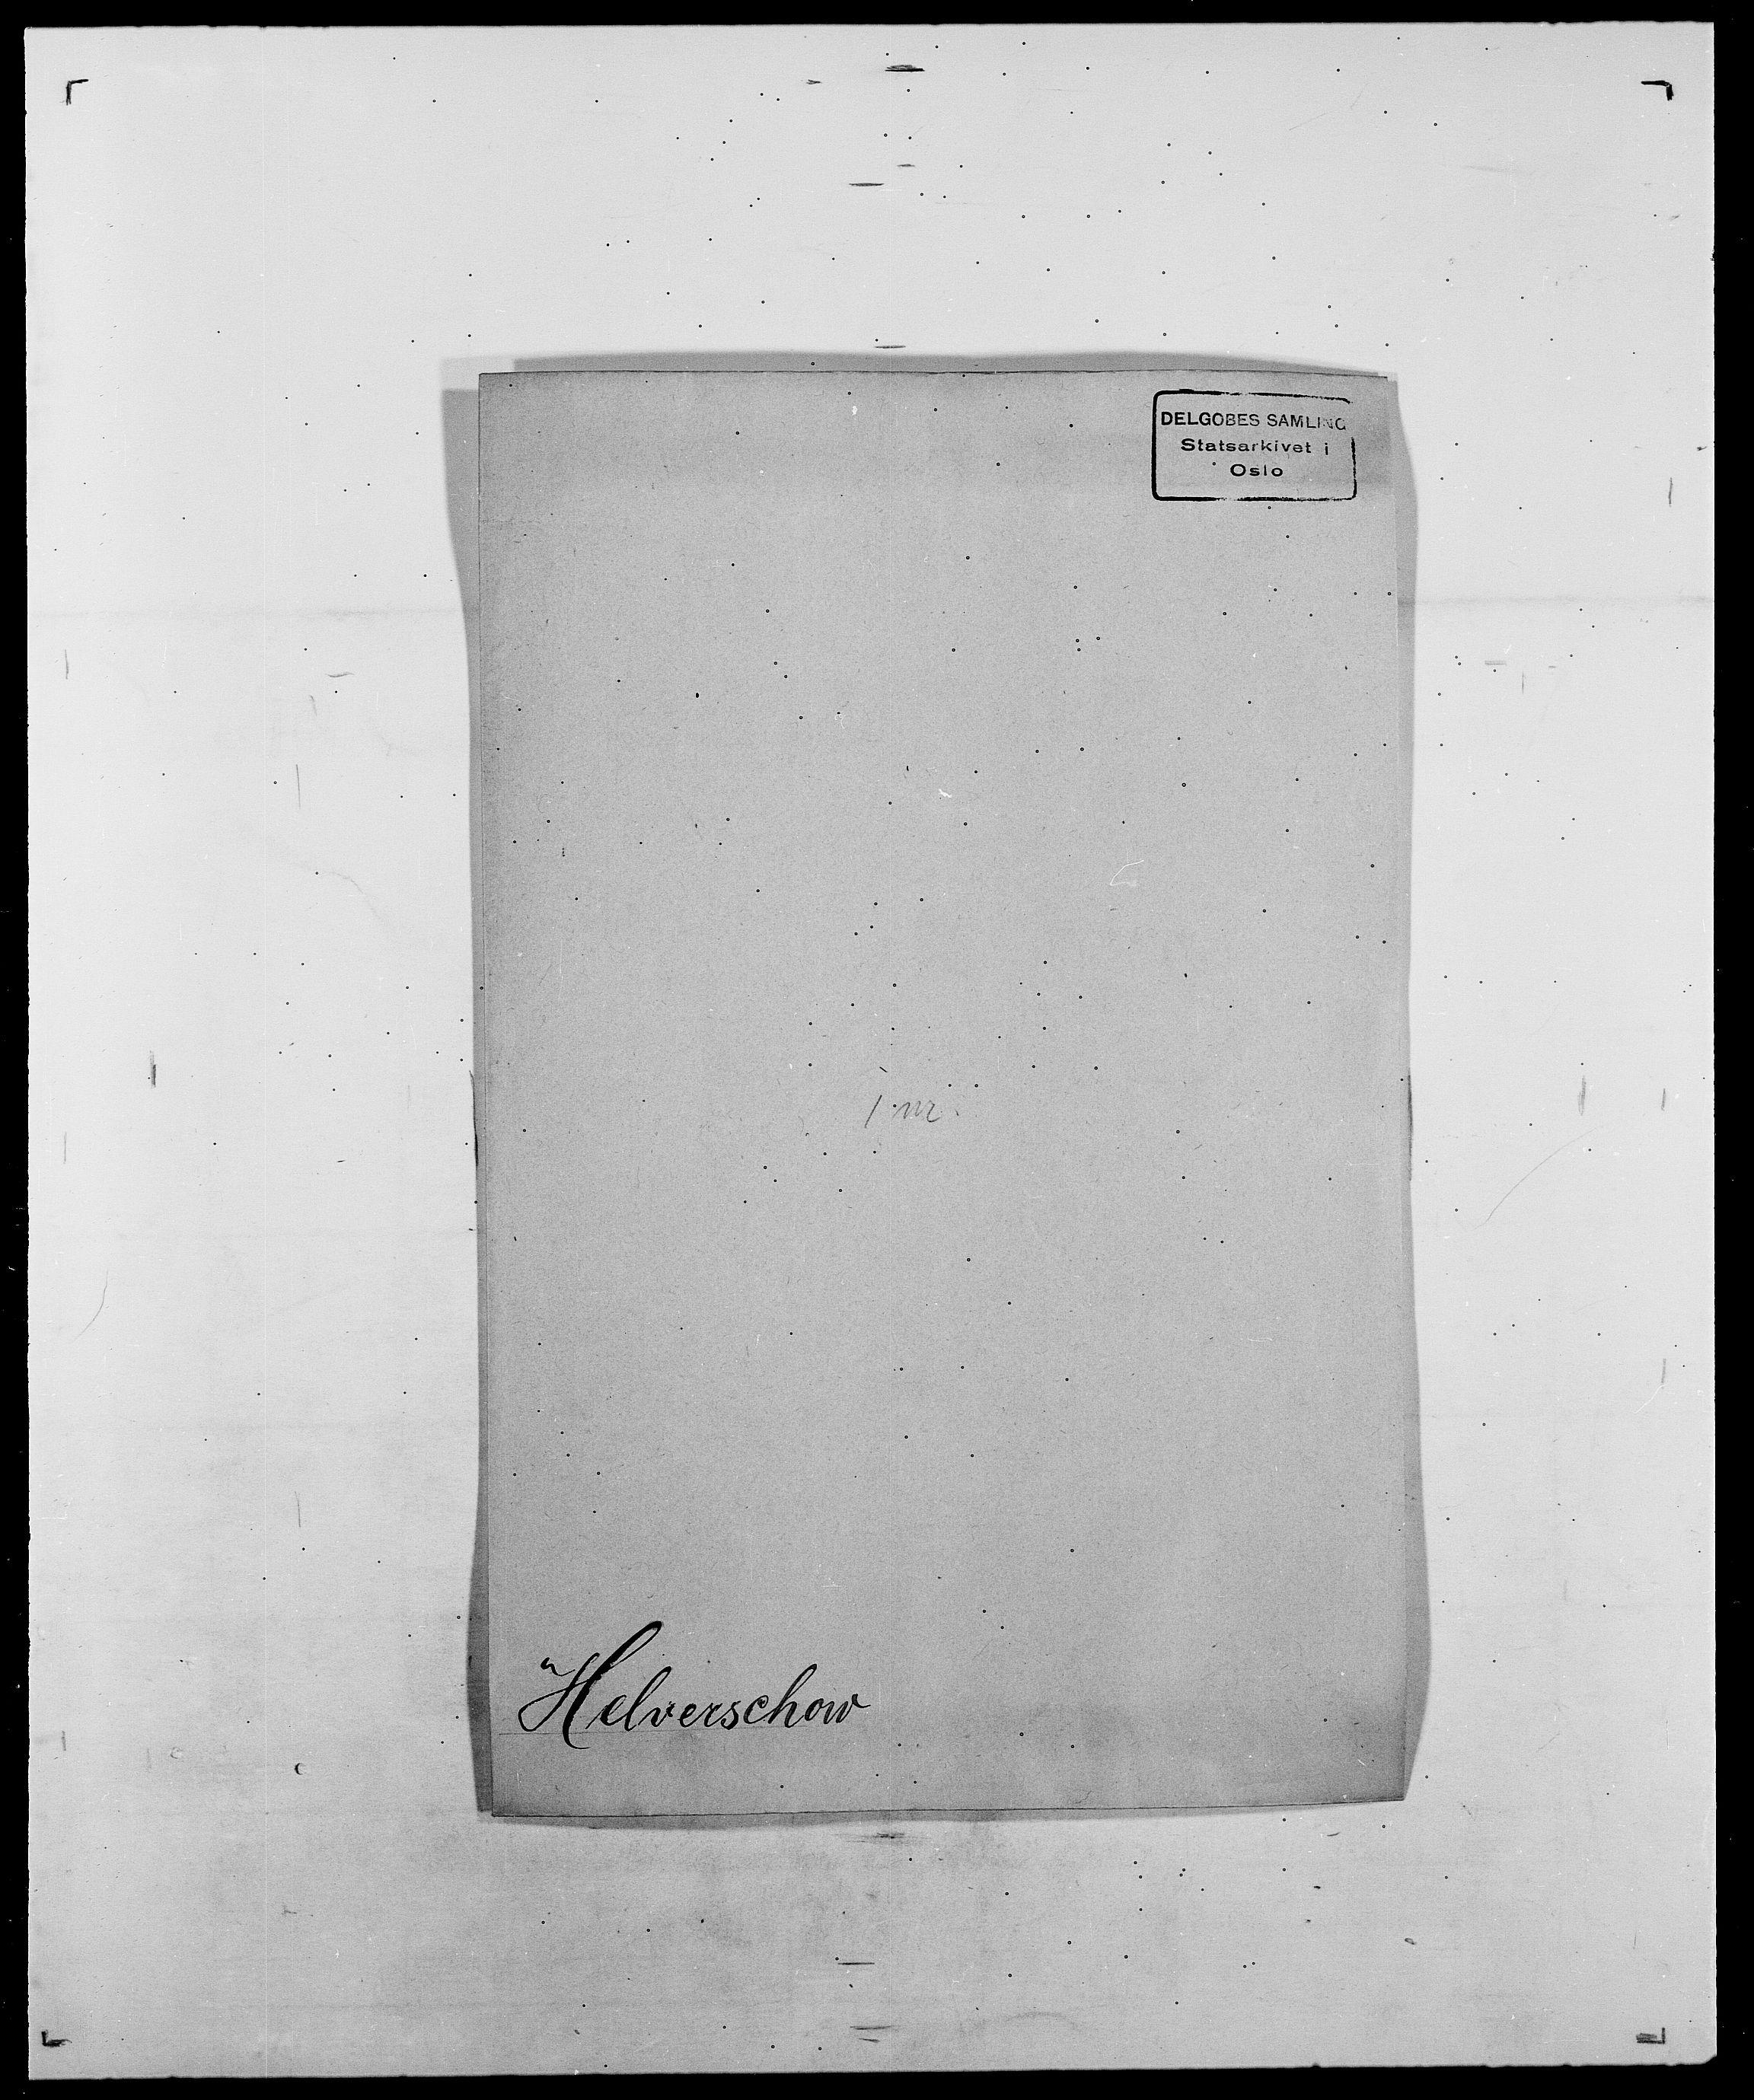 SAO, Delgobe, Charles Antoine - samling, D/Da/L0017: Helander - Hjørne, s. 147